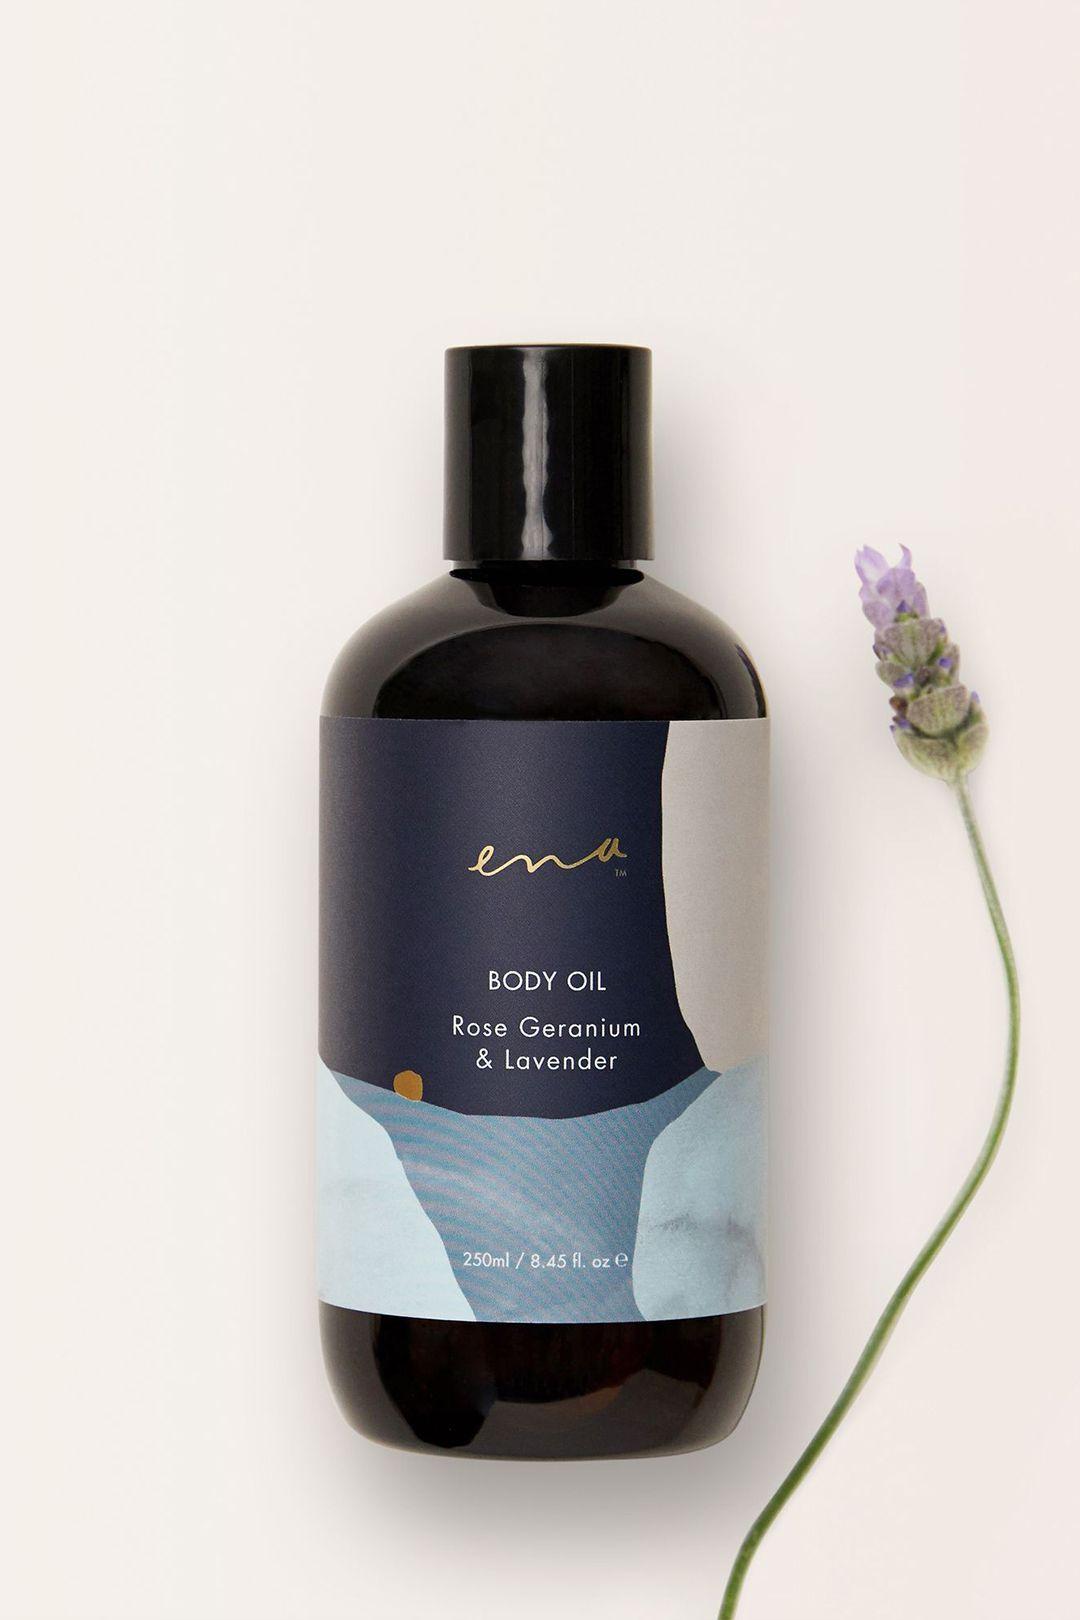 Ena-Body-Oil-Rose-Geranium-and-Lavender-Product